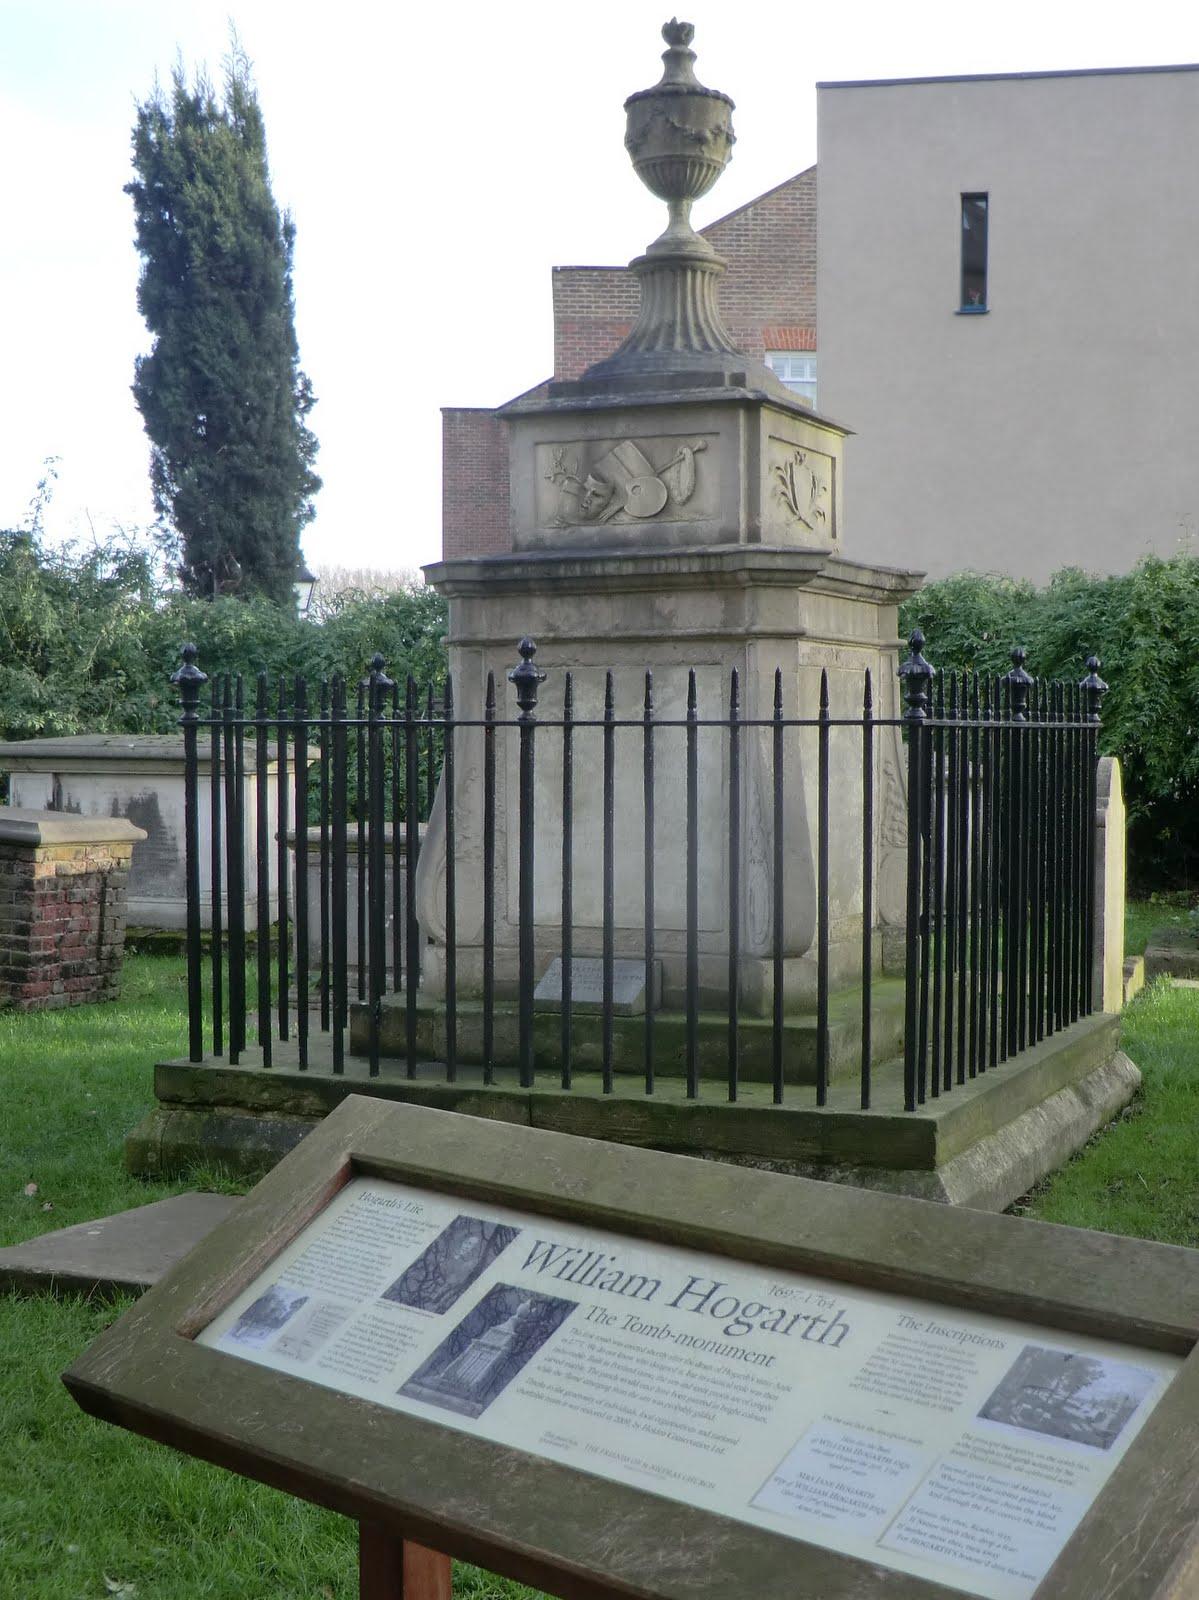 CIMG2165 William Hogarth Tomb-Monument, Chiswick church